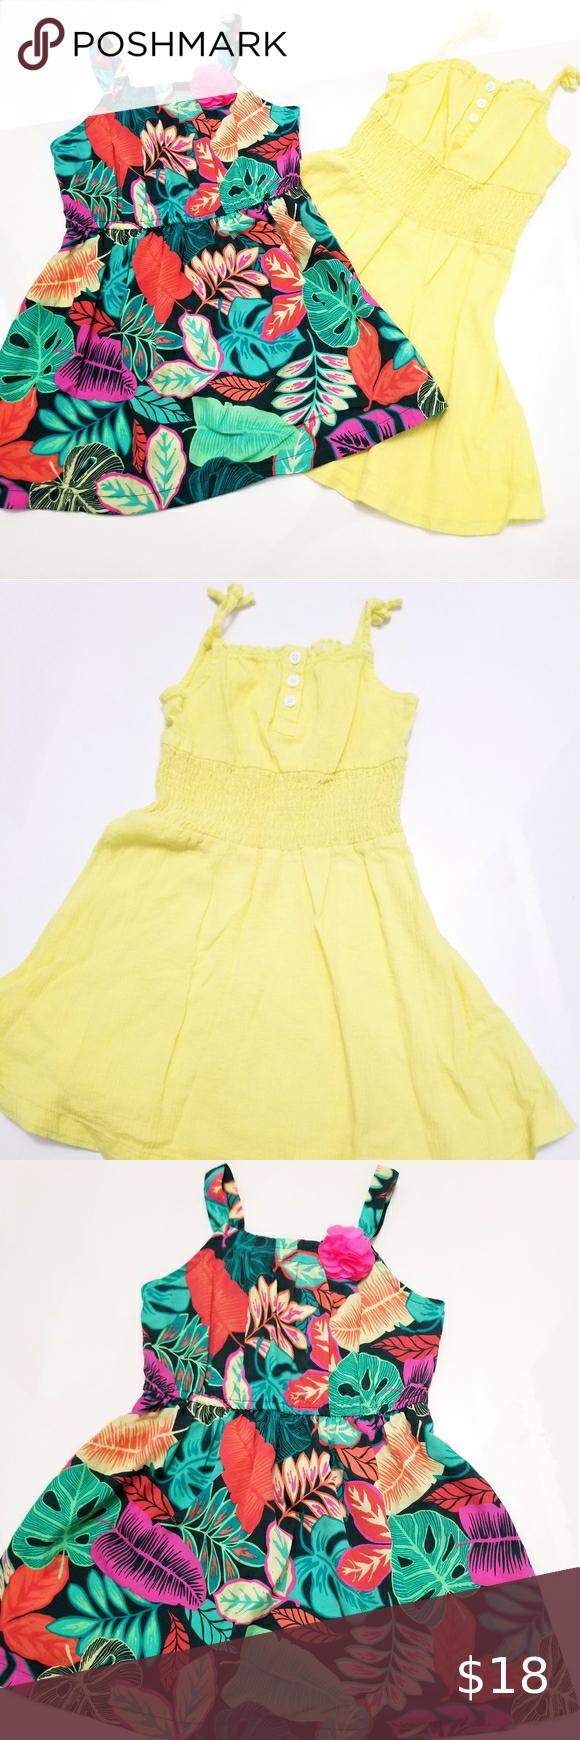 Set Of 2 Toddler Girl Summer Dresses 4t Toddler Girl Dresses Summer Girls Dresses Summer Toddler Girl Summer [ 1740 x 580 Pixel ]